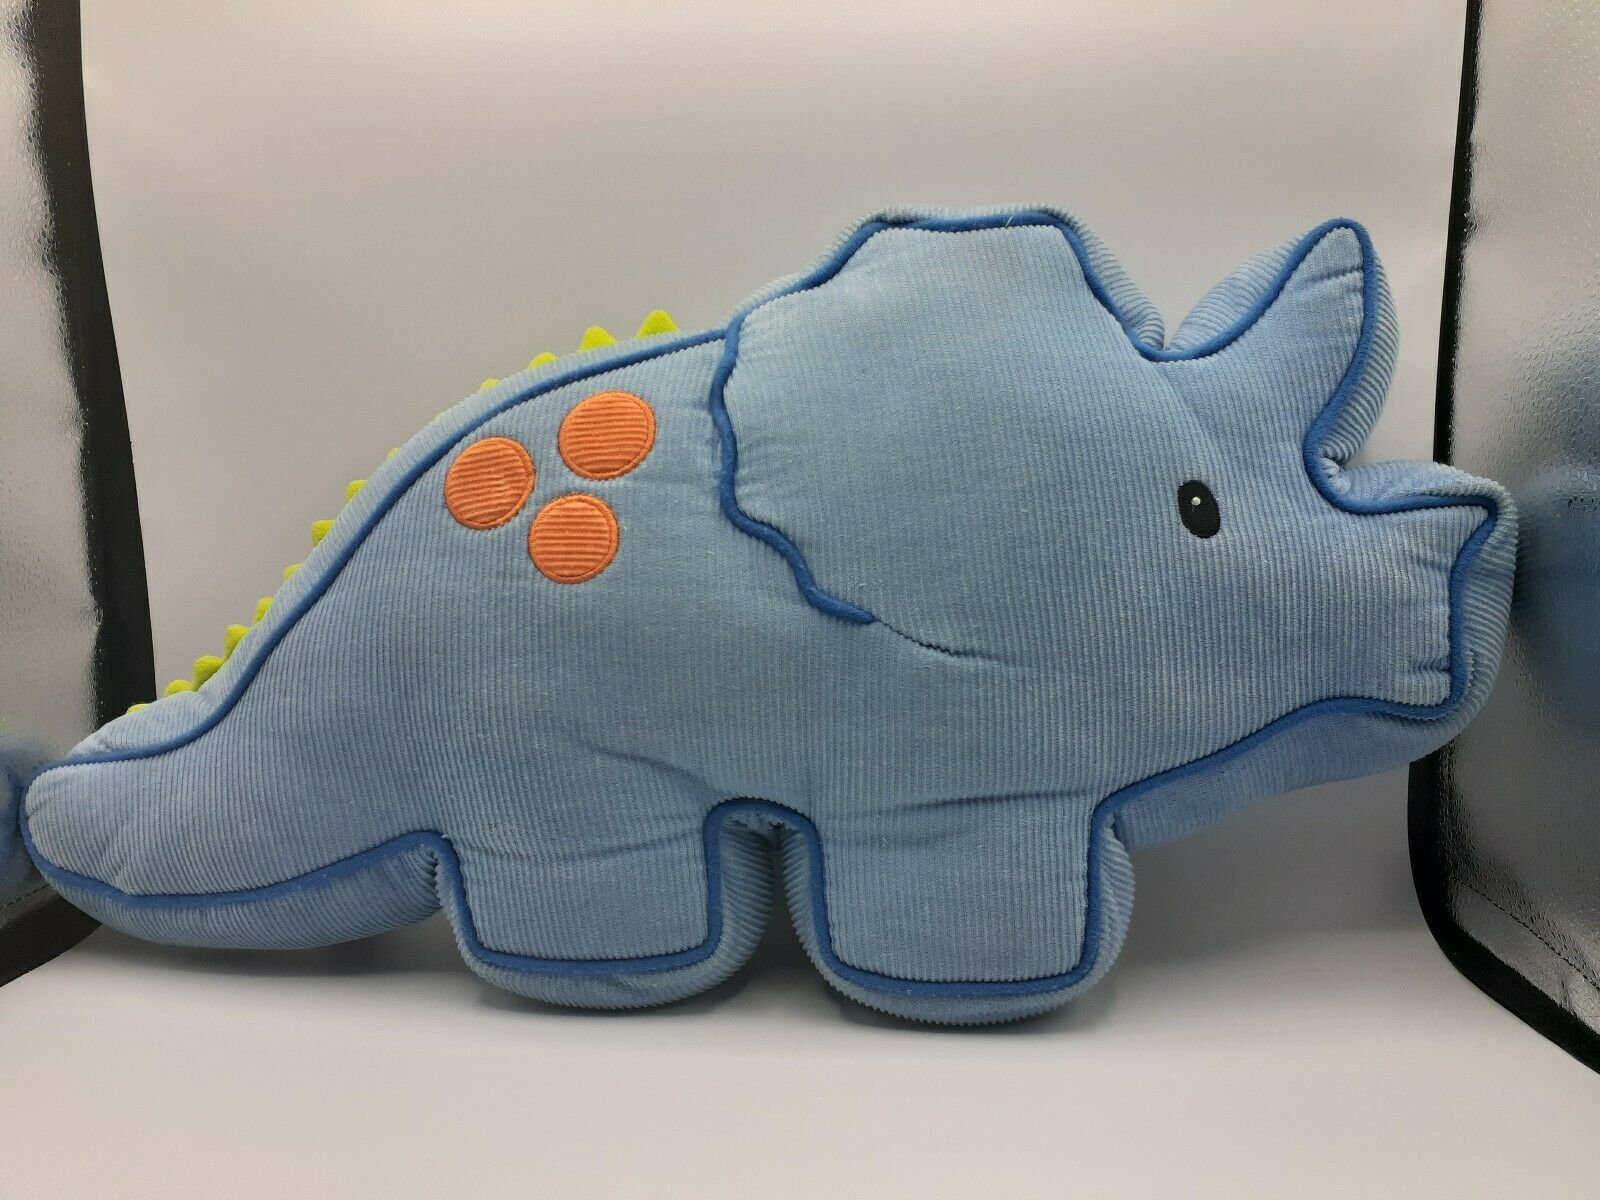 Gund Aaaah Dinosaurs Trevor Plush Pillow Corduroy Triceratops 20